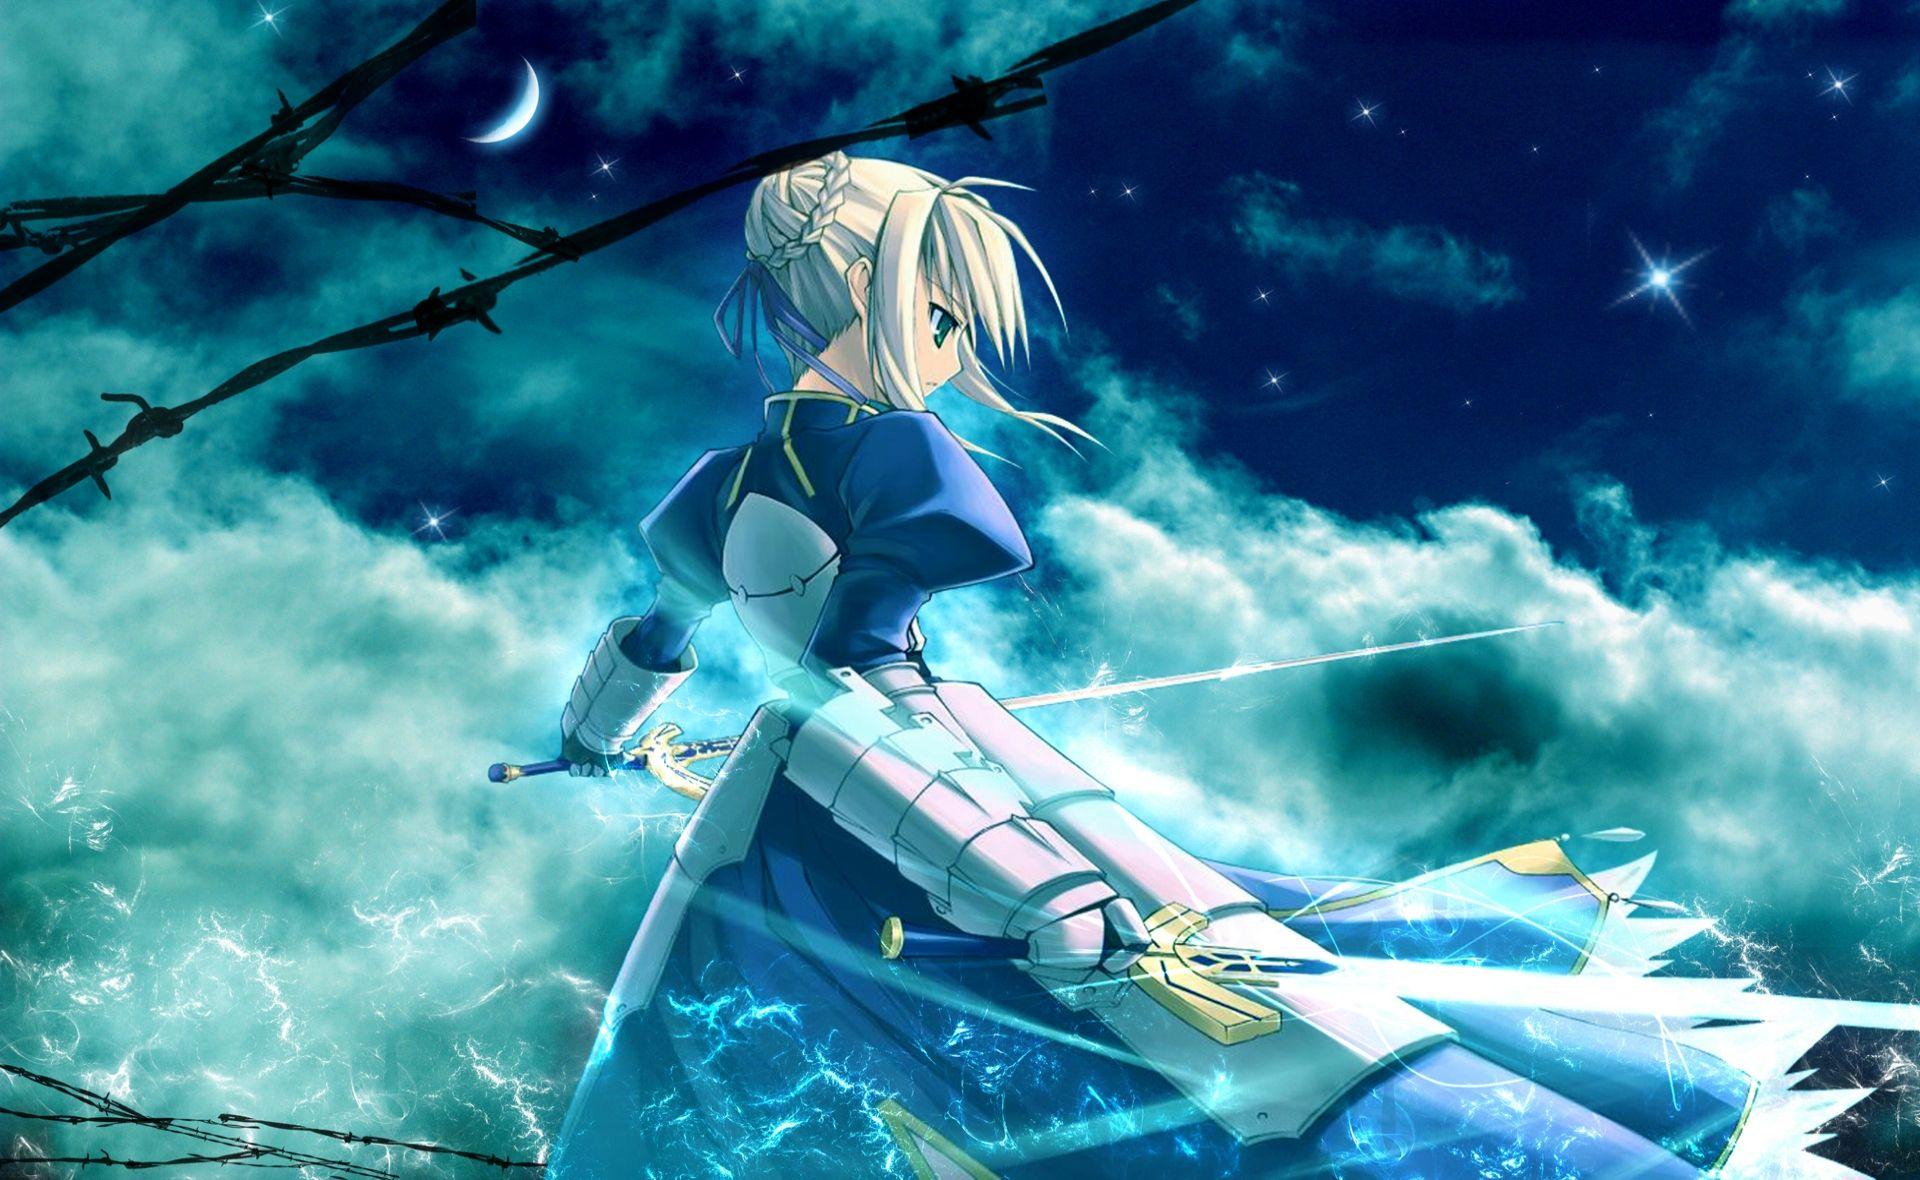 Minitokyo_Fate-Stay_Night_Wallpapers_411423.jpg